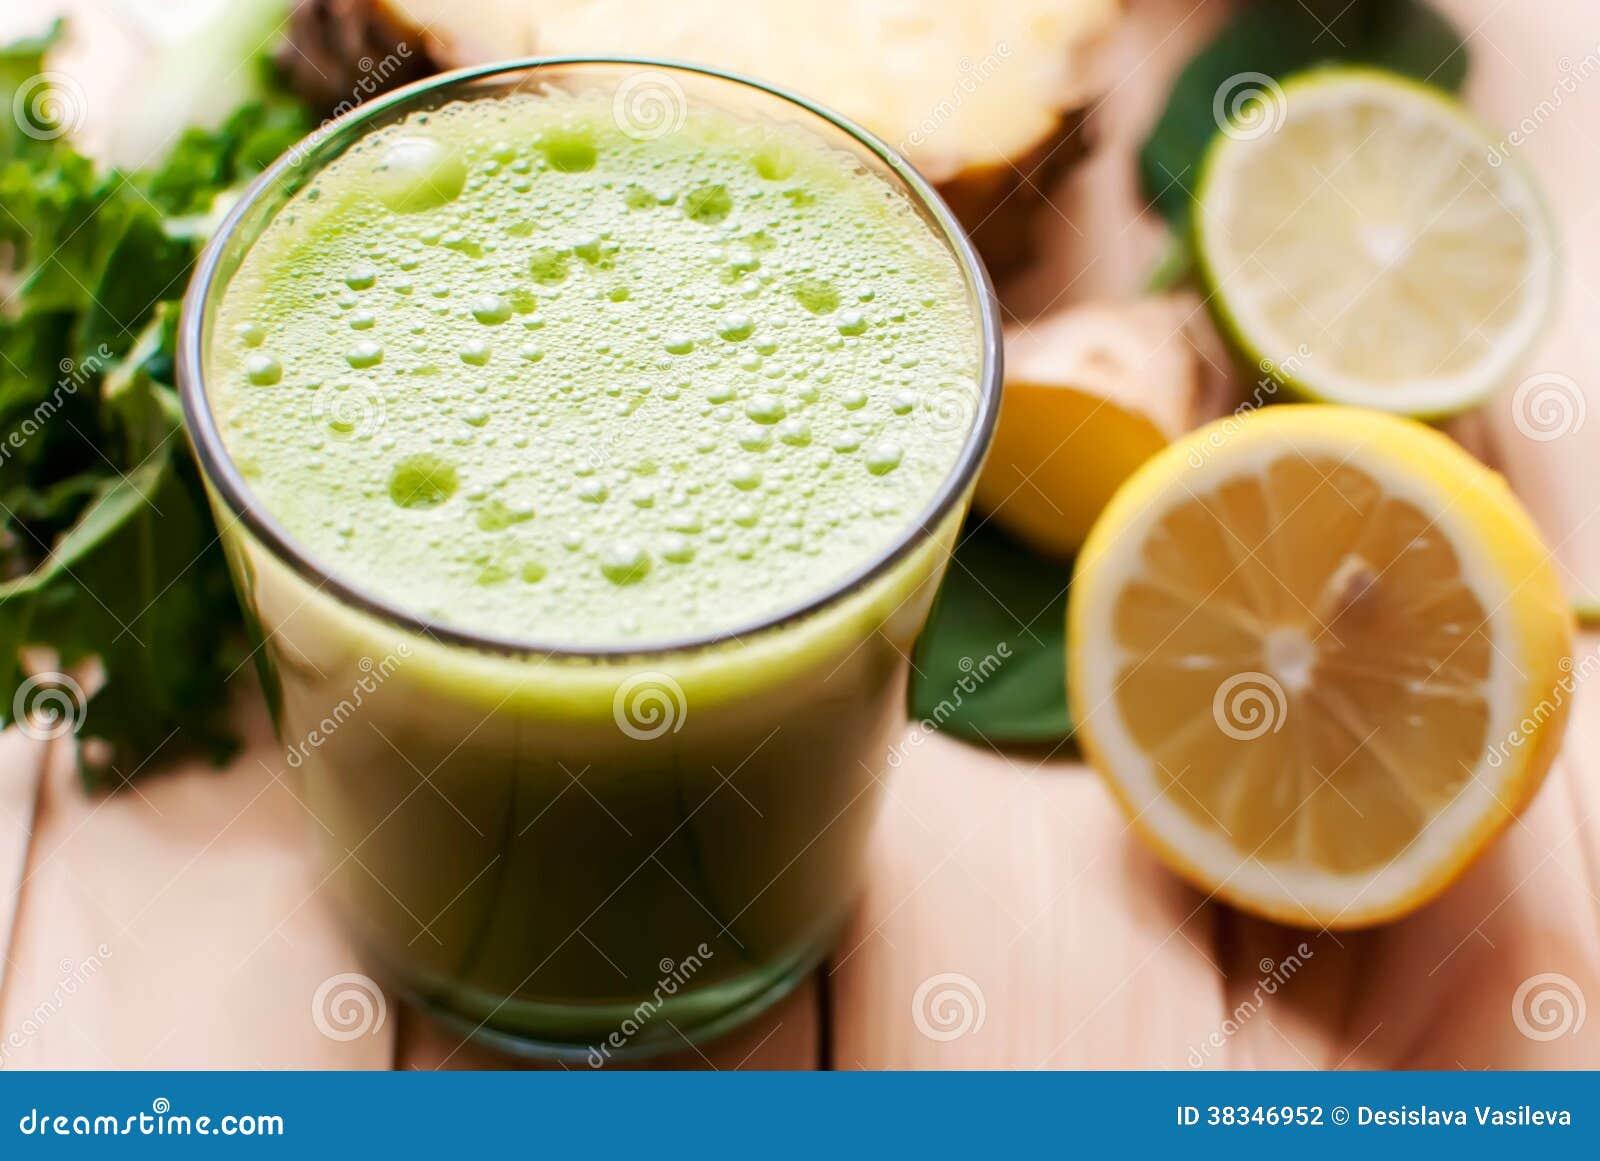 Sund grön detoxfruktsaft